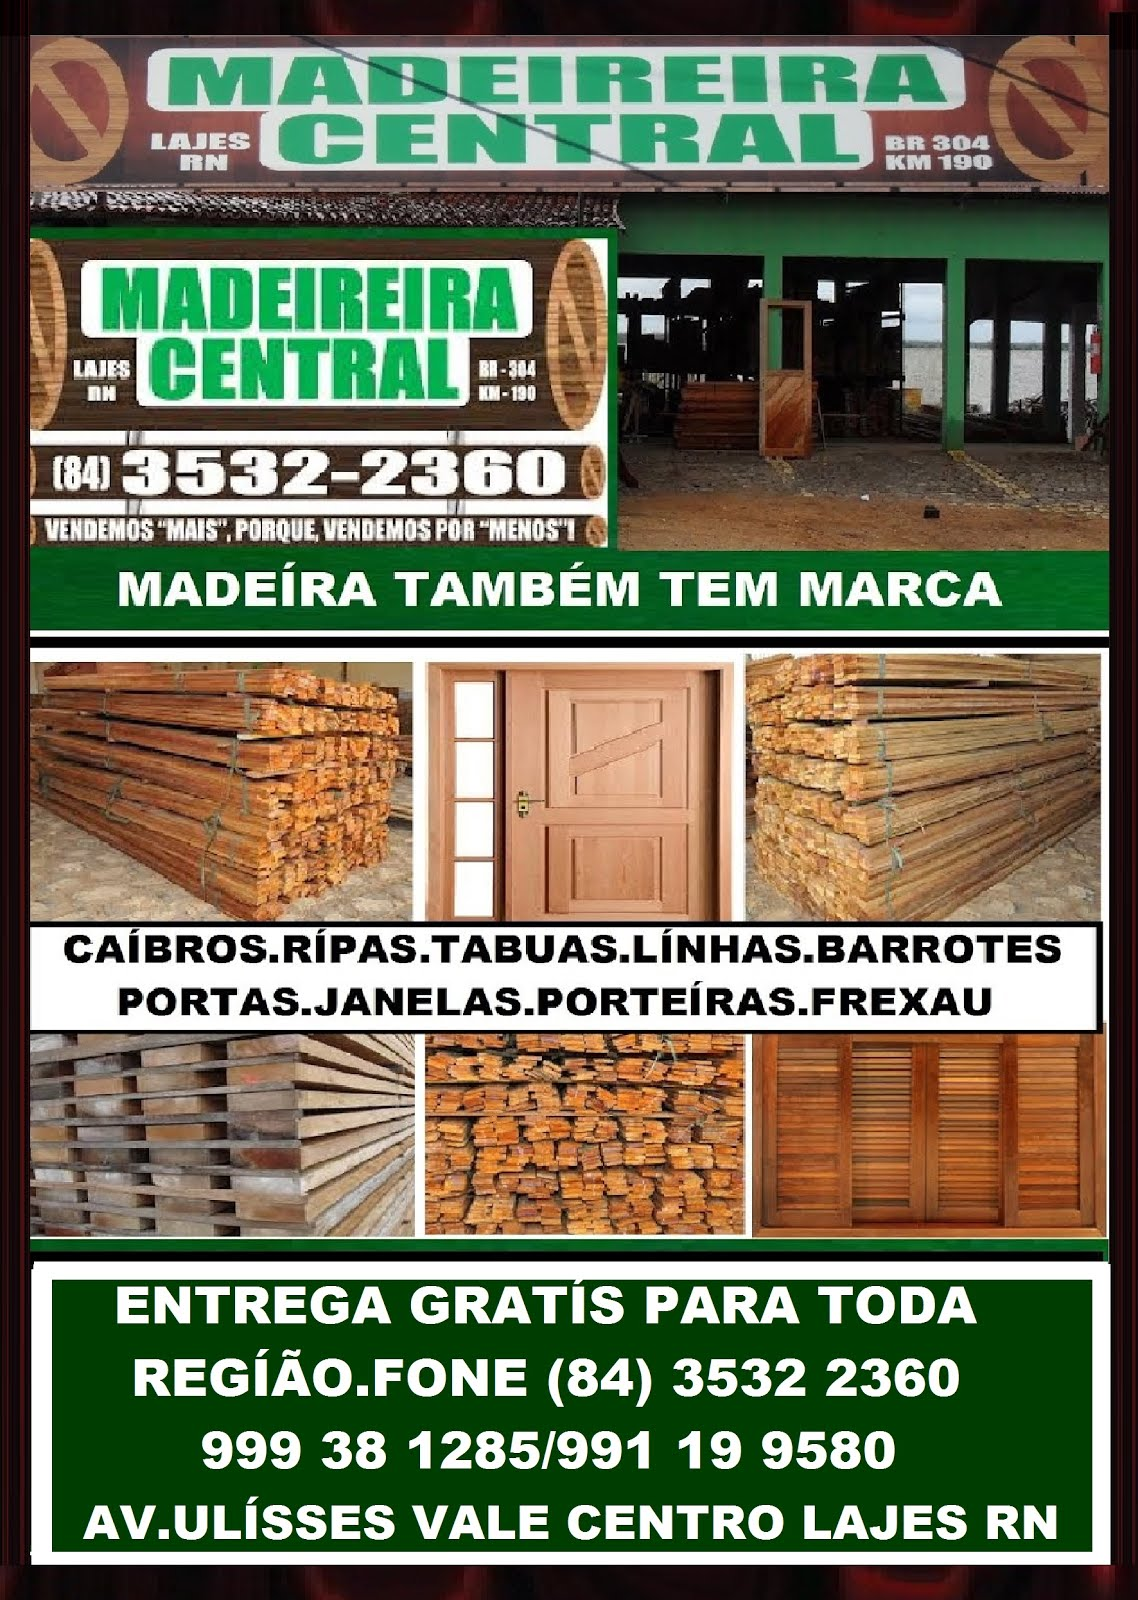 MADEREÍRA CENTRAL LAJES RN.